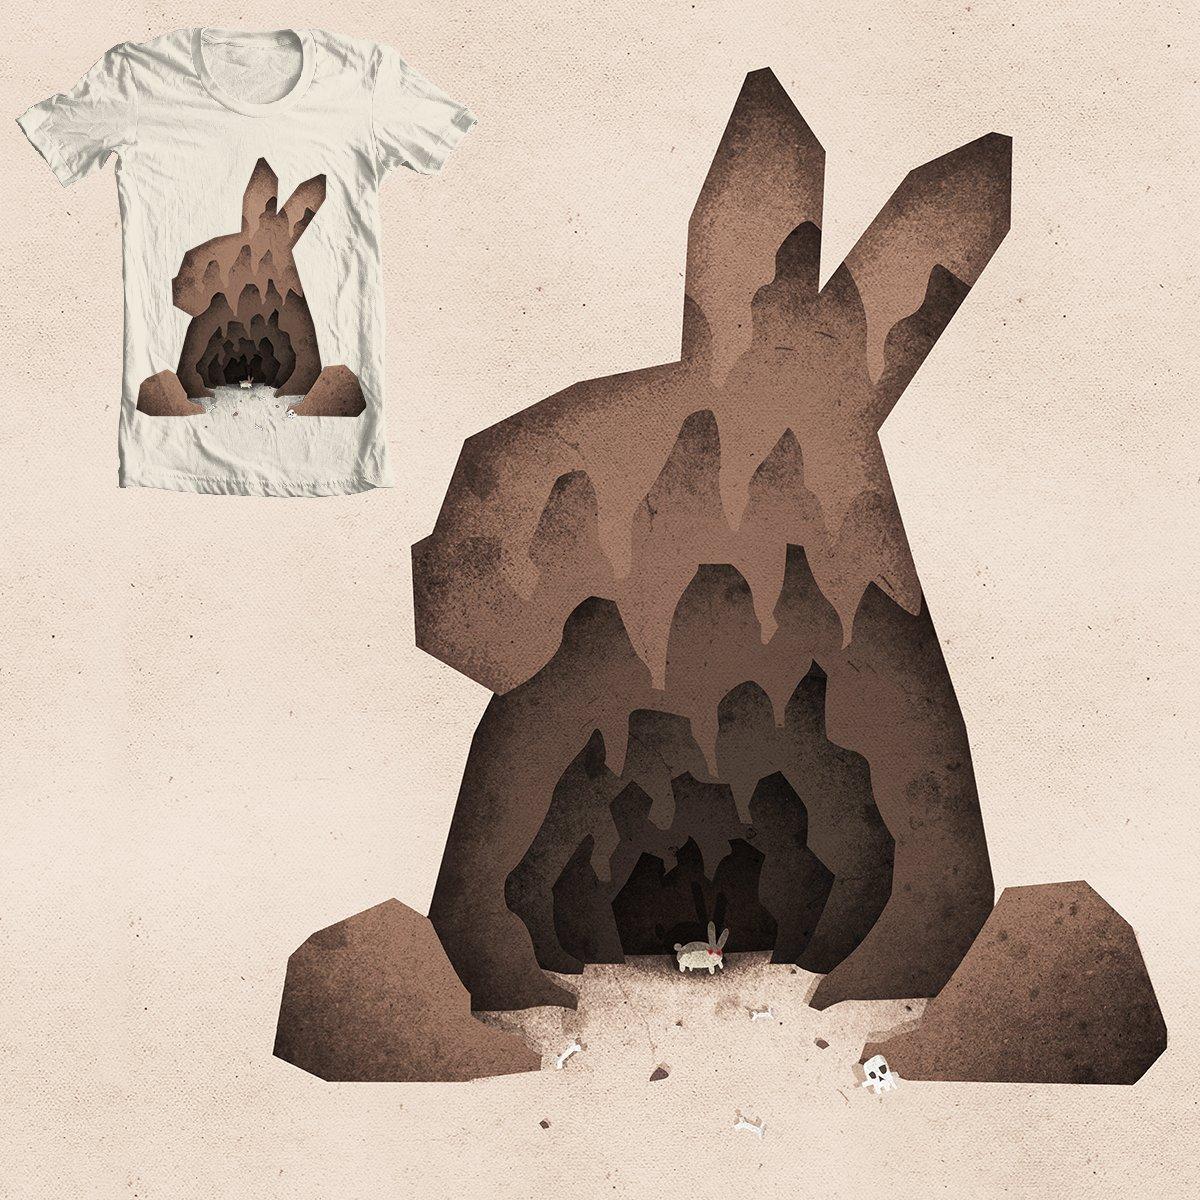 A Monty Python Inspired Illustration of the Rabbit of Caerbannog